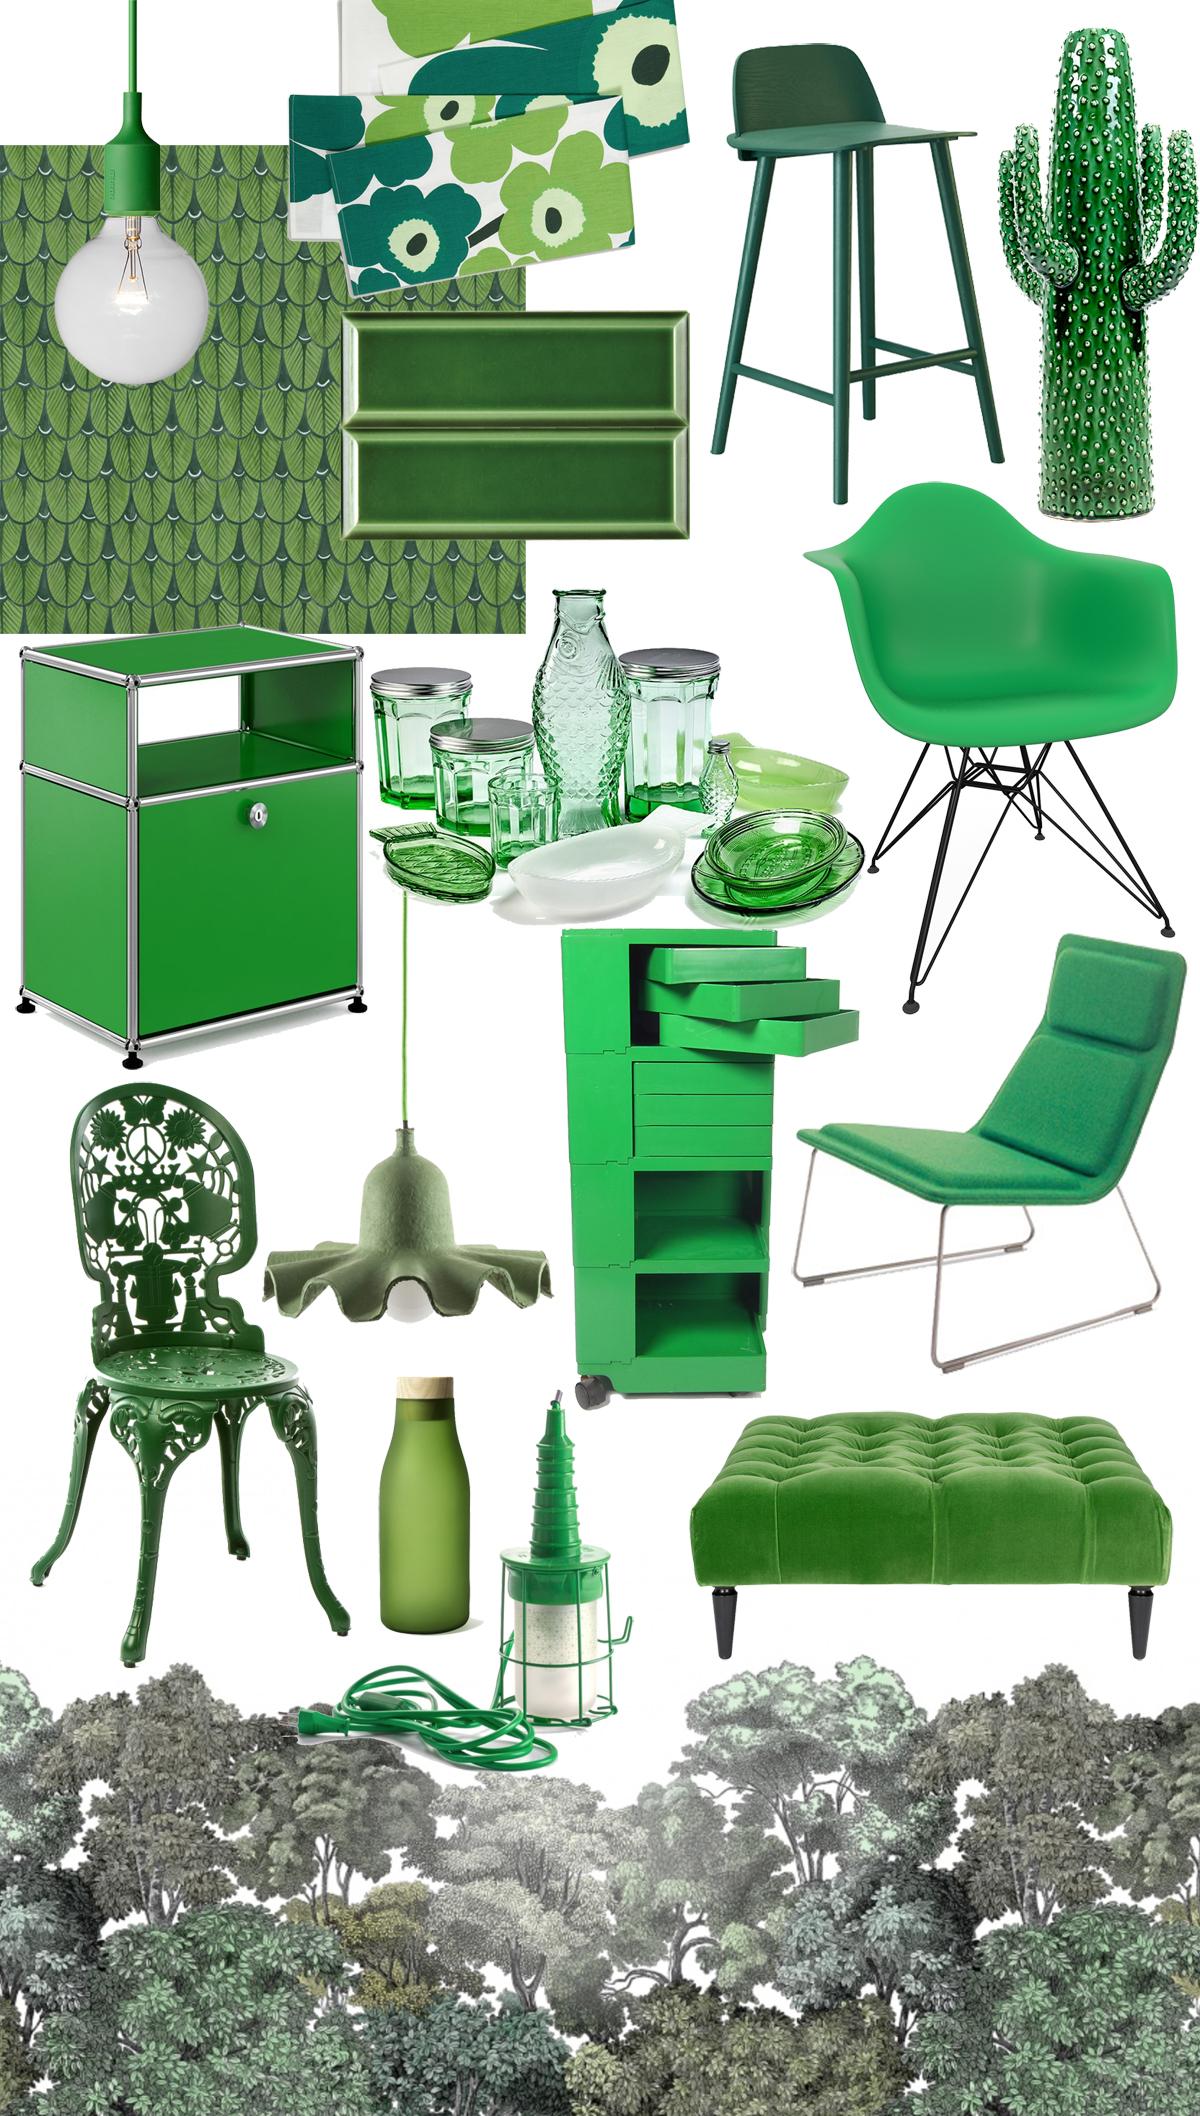 tendenza colore verde arredamento